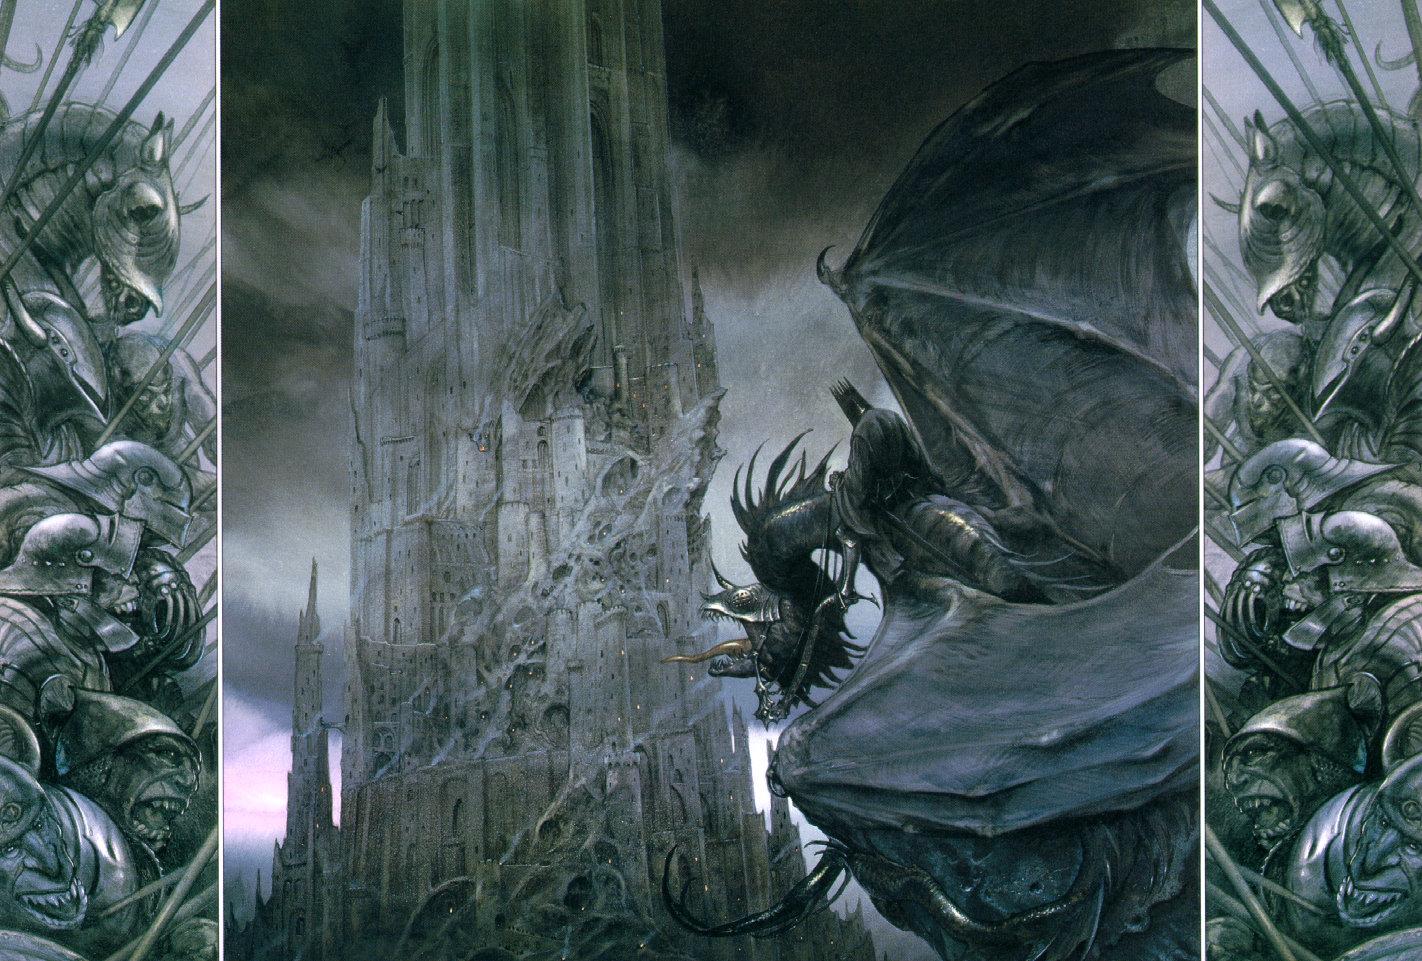 http://www.nasha-lavochka.ru/images/john_howe/dark_tower.jpg